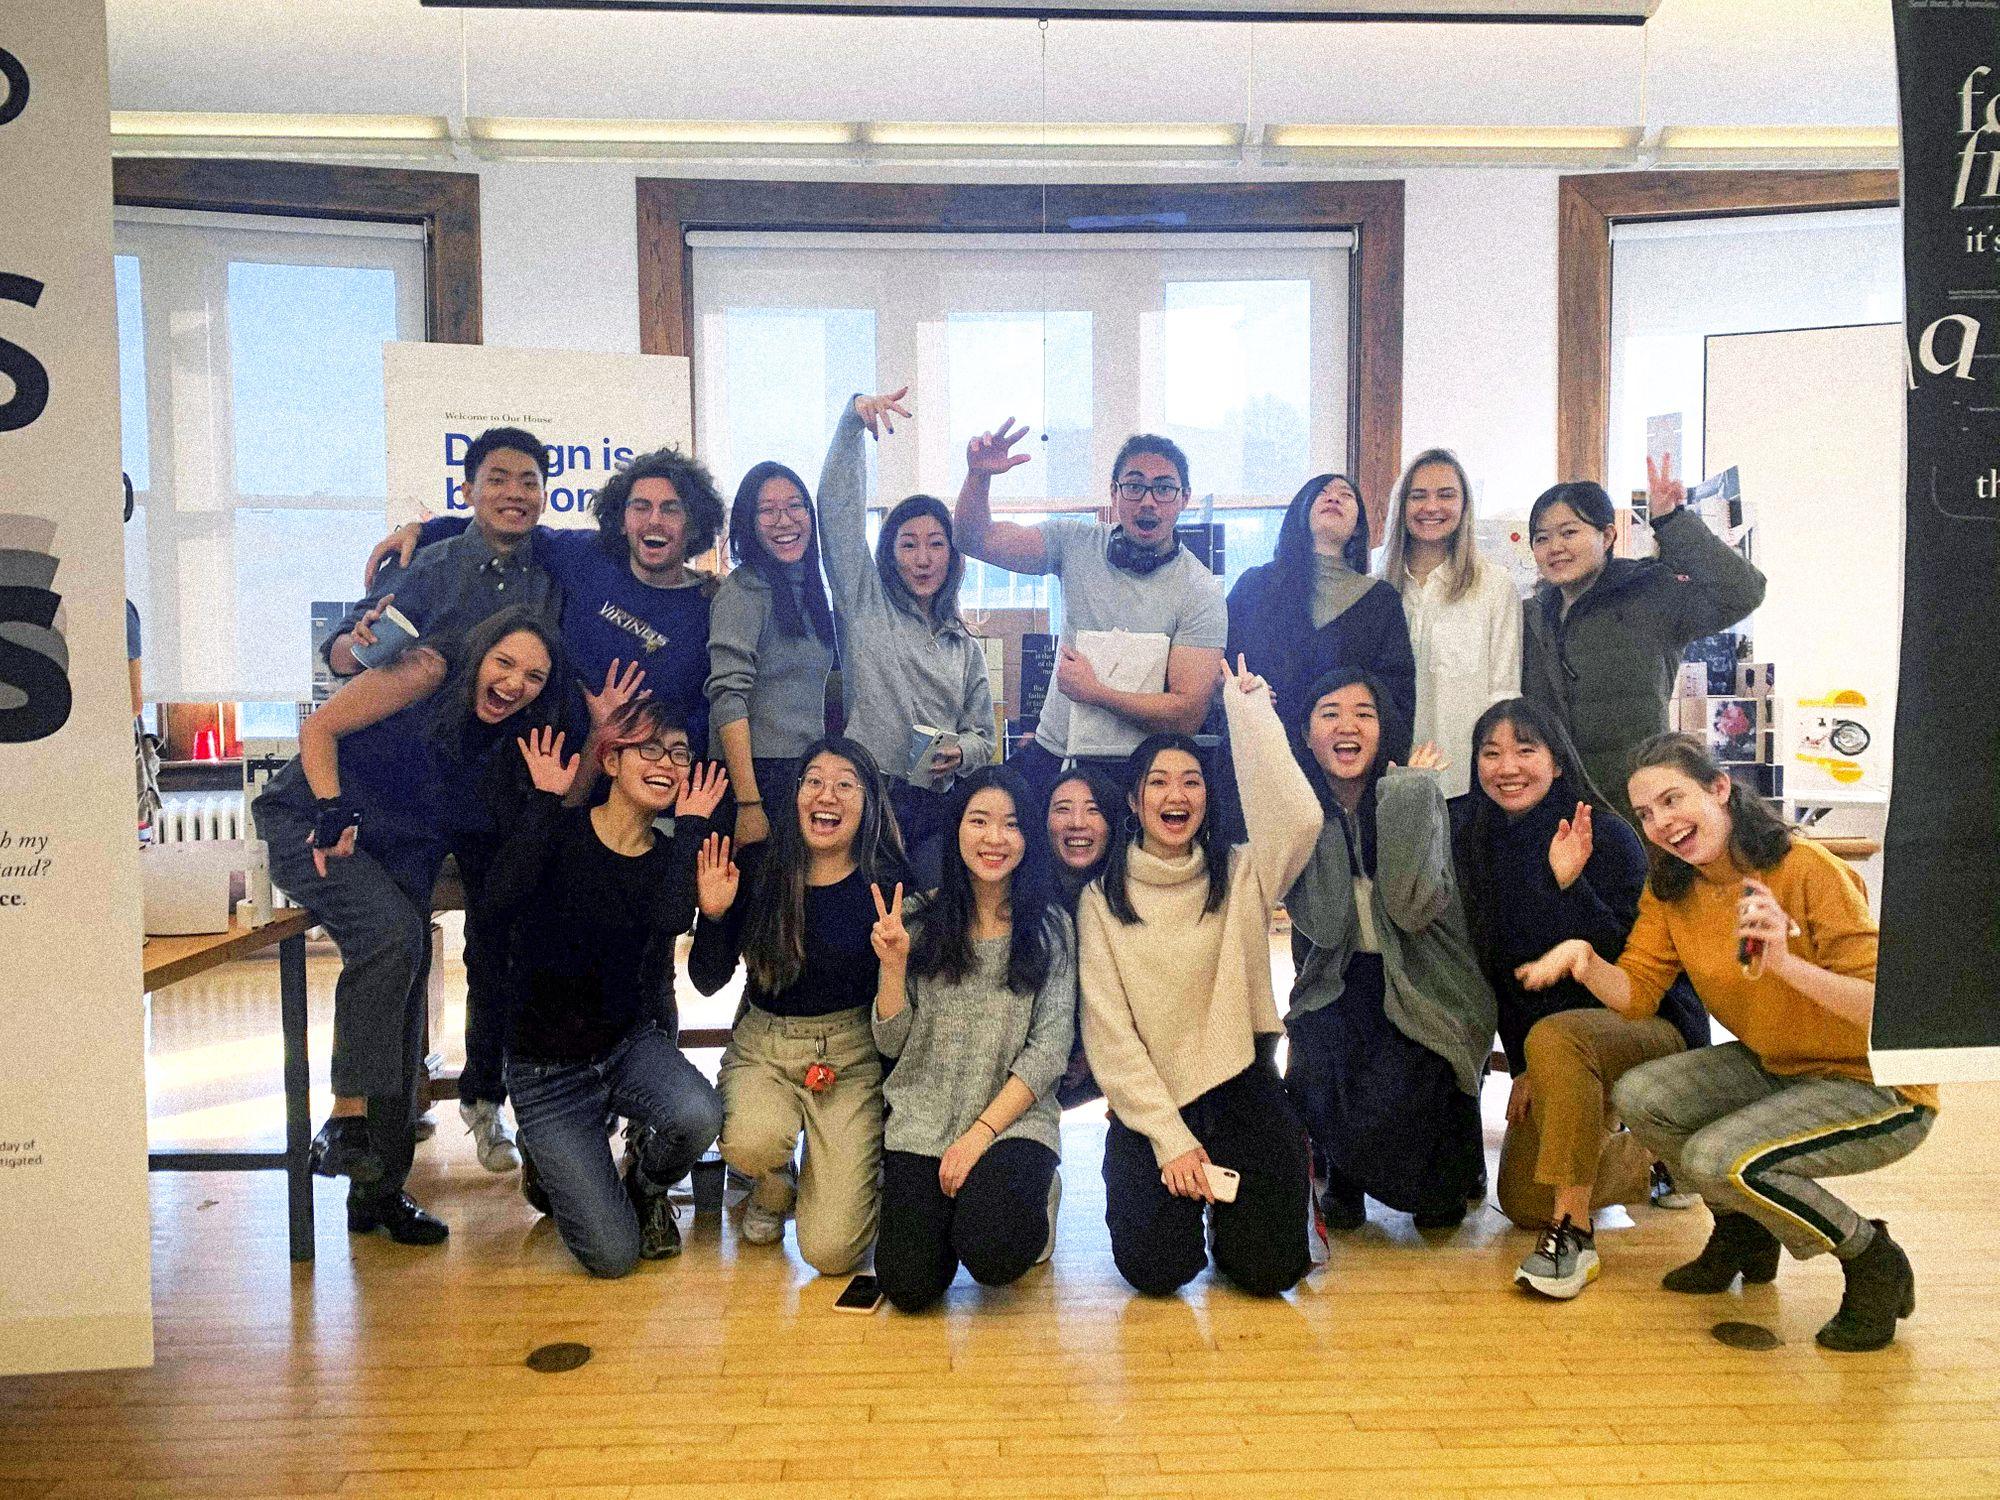 Robert Managad with the Carnegie Mellon communications design class of 2021